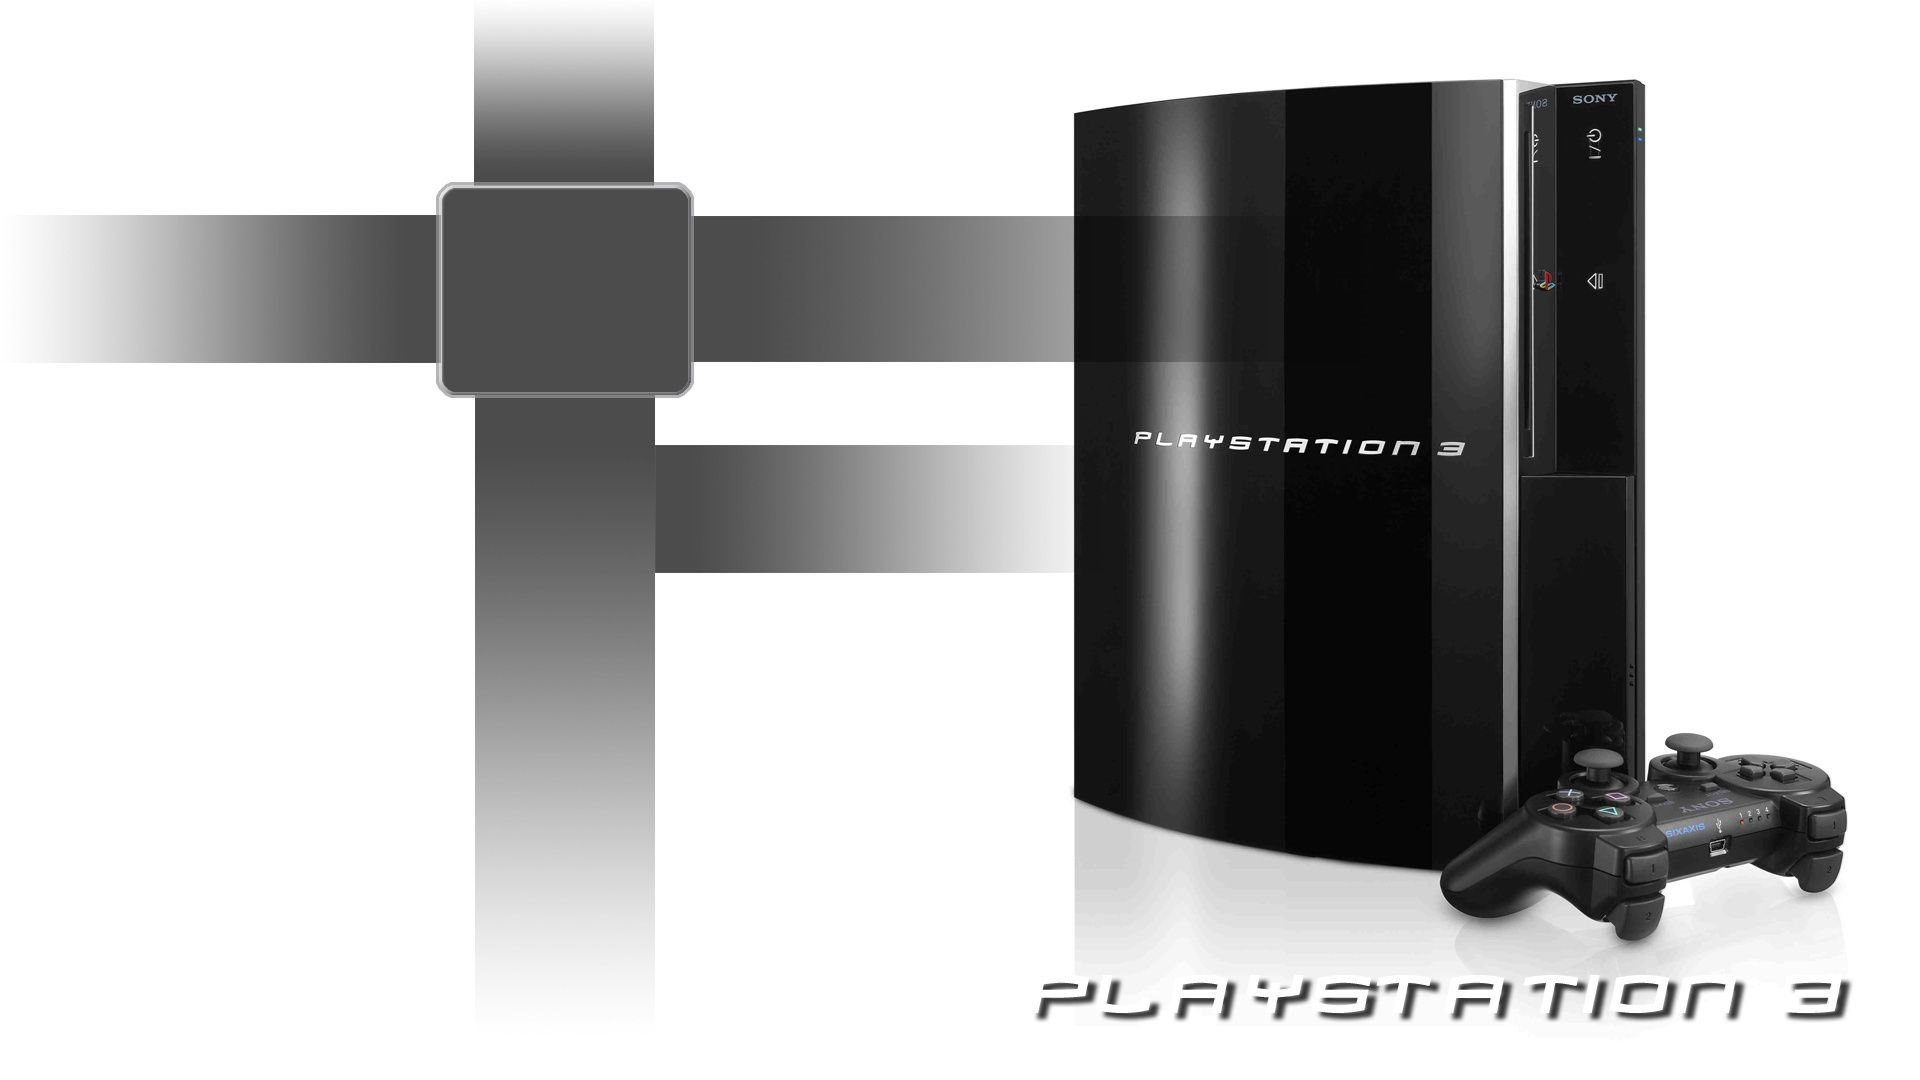 1920x1080 console ps3 white background joystick playstation 3 popular voltagebd Gallery